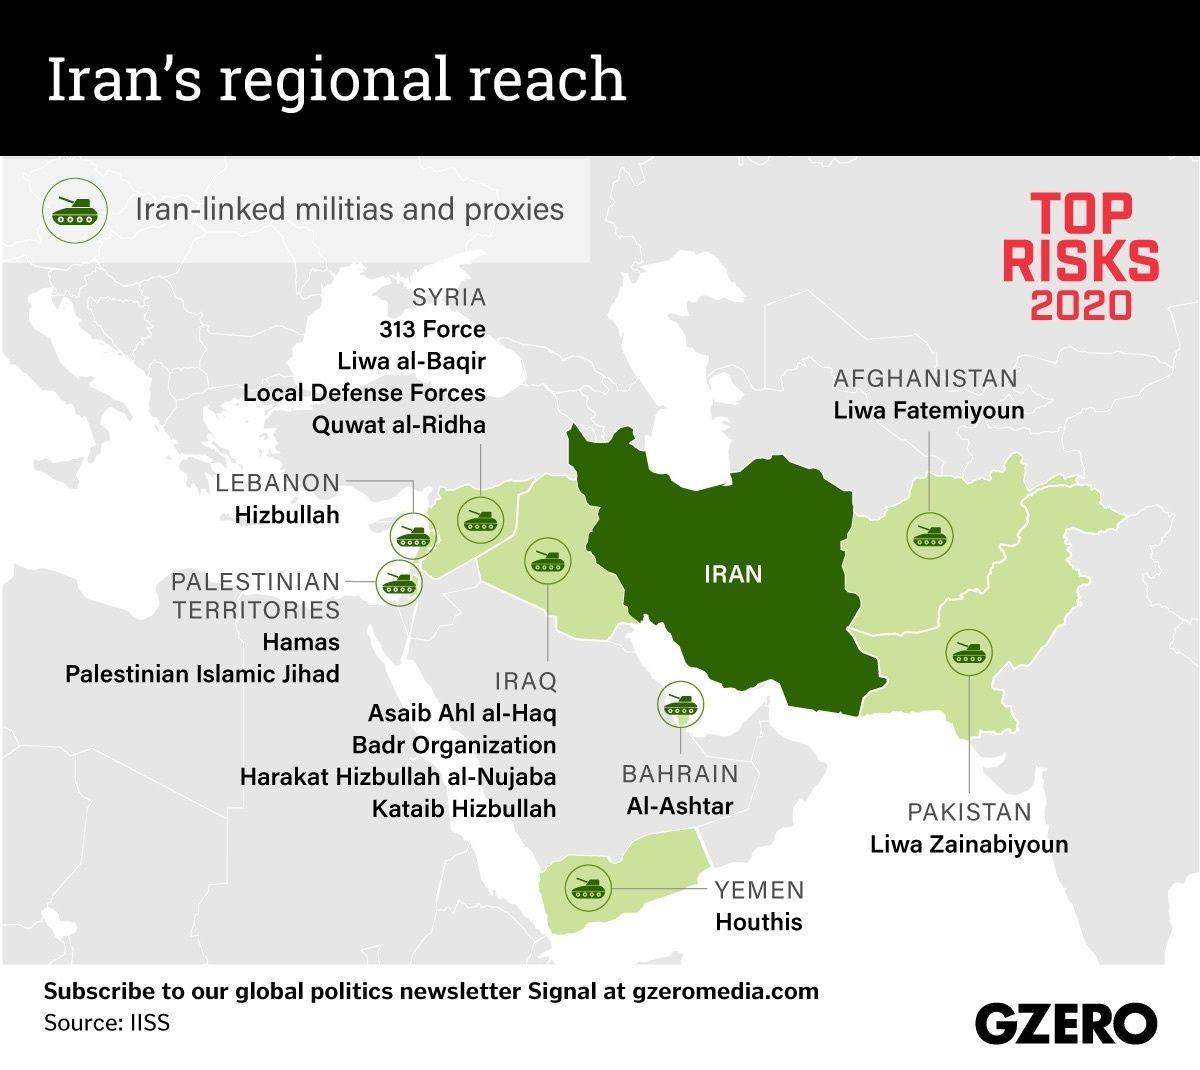 The Graphic Truth: Iran's regional reach